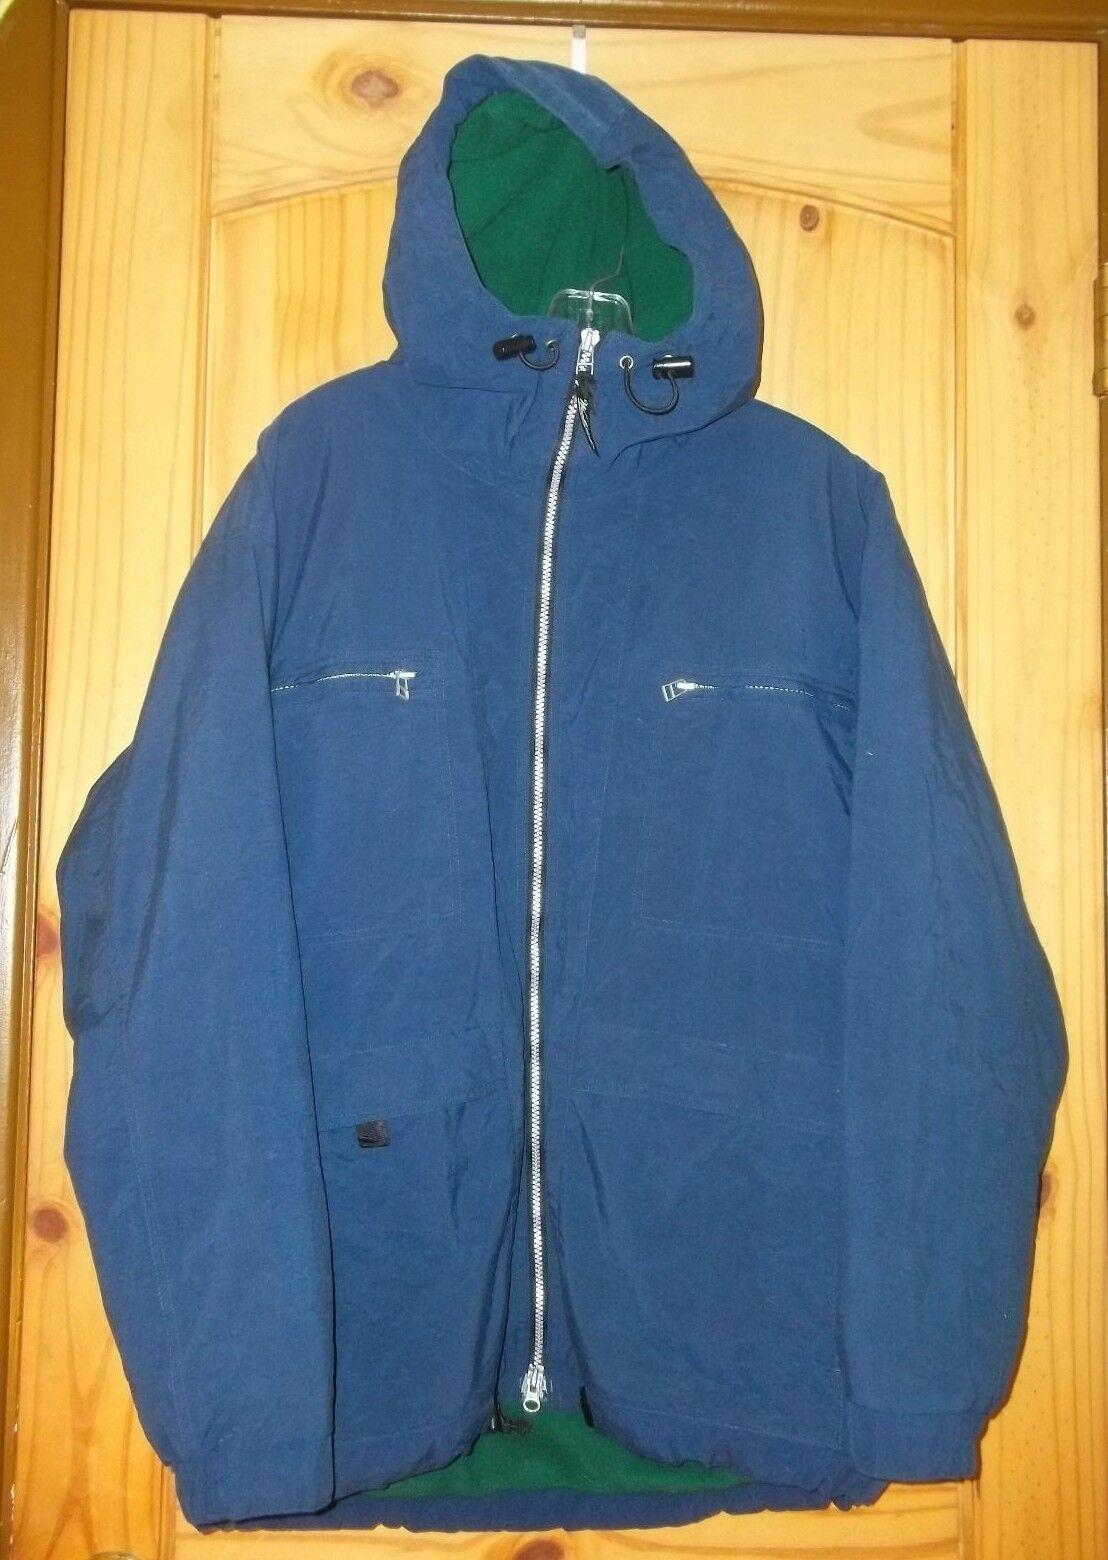 Woolrich Navy bluee Hooded Fleece-lined & Insulated Coat, Mens M